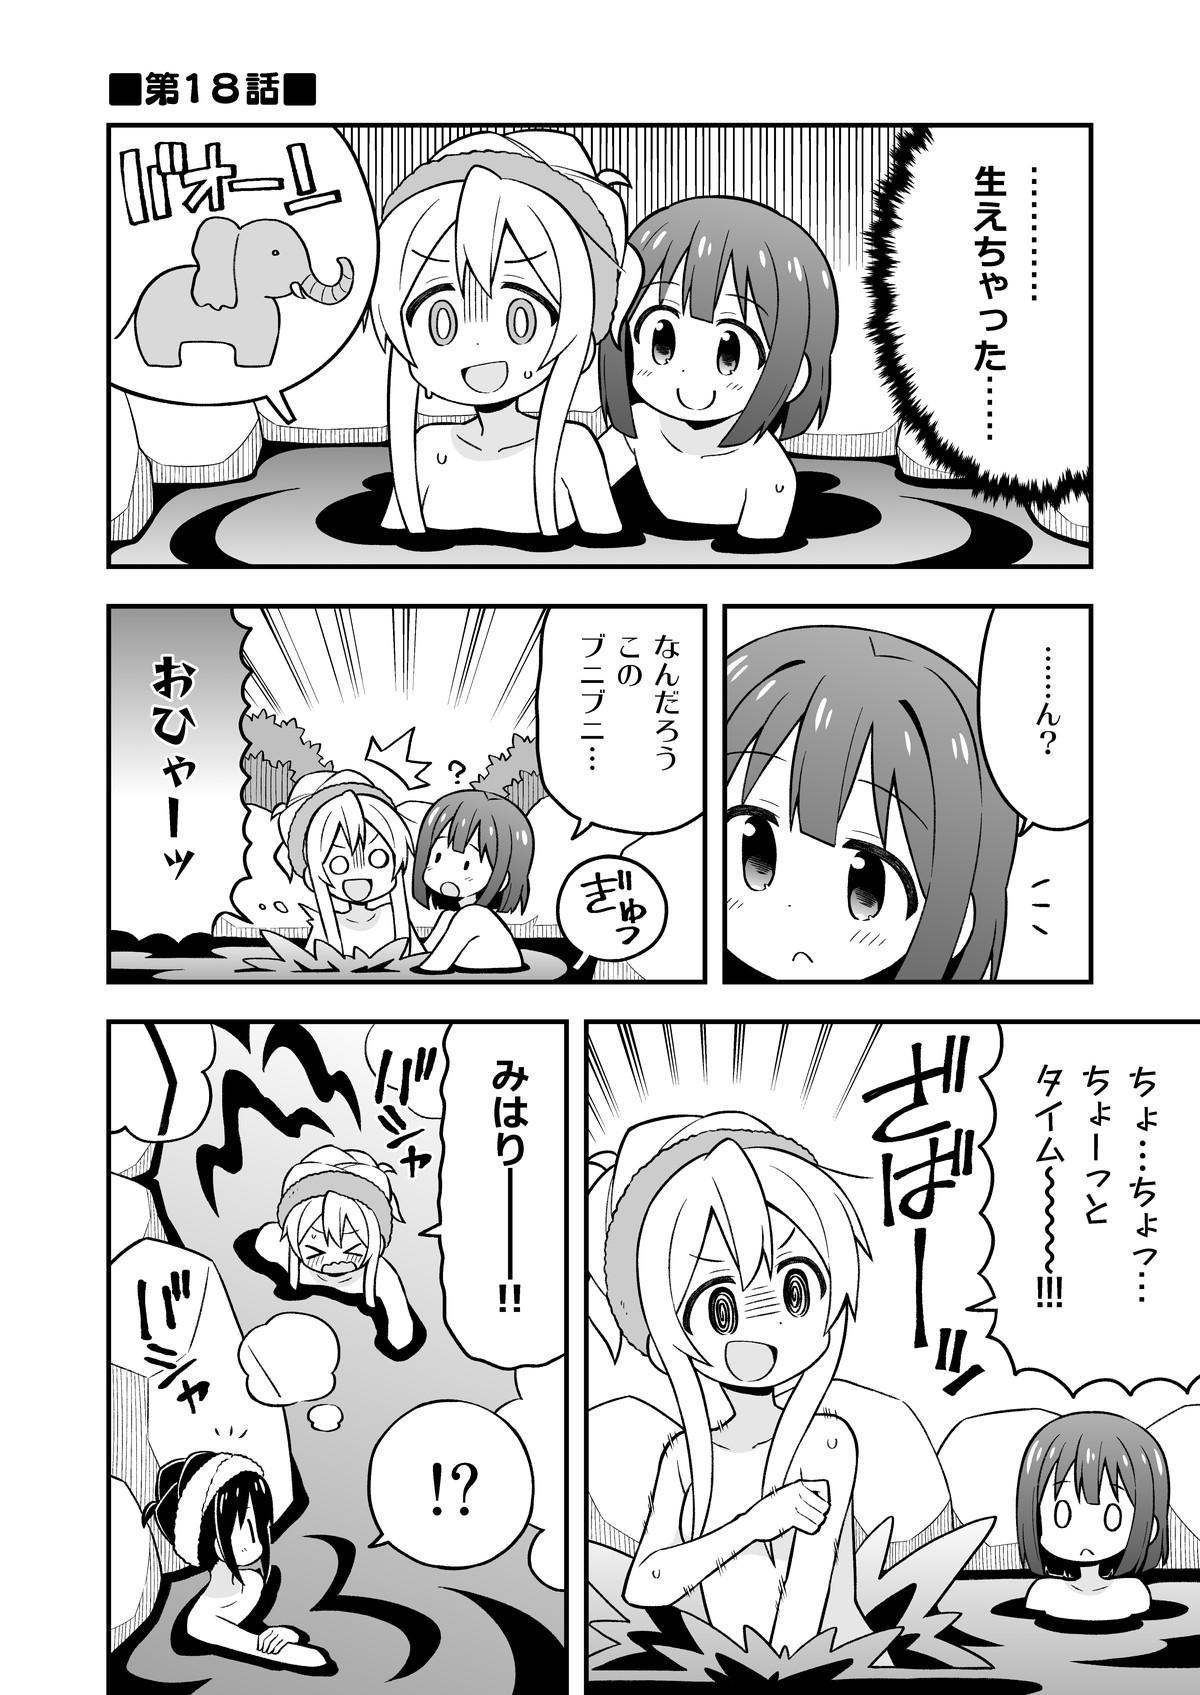 Onii-chan wa Oshimai! 6 28